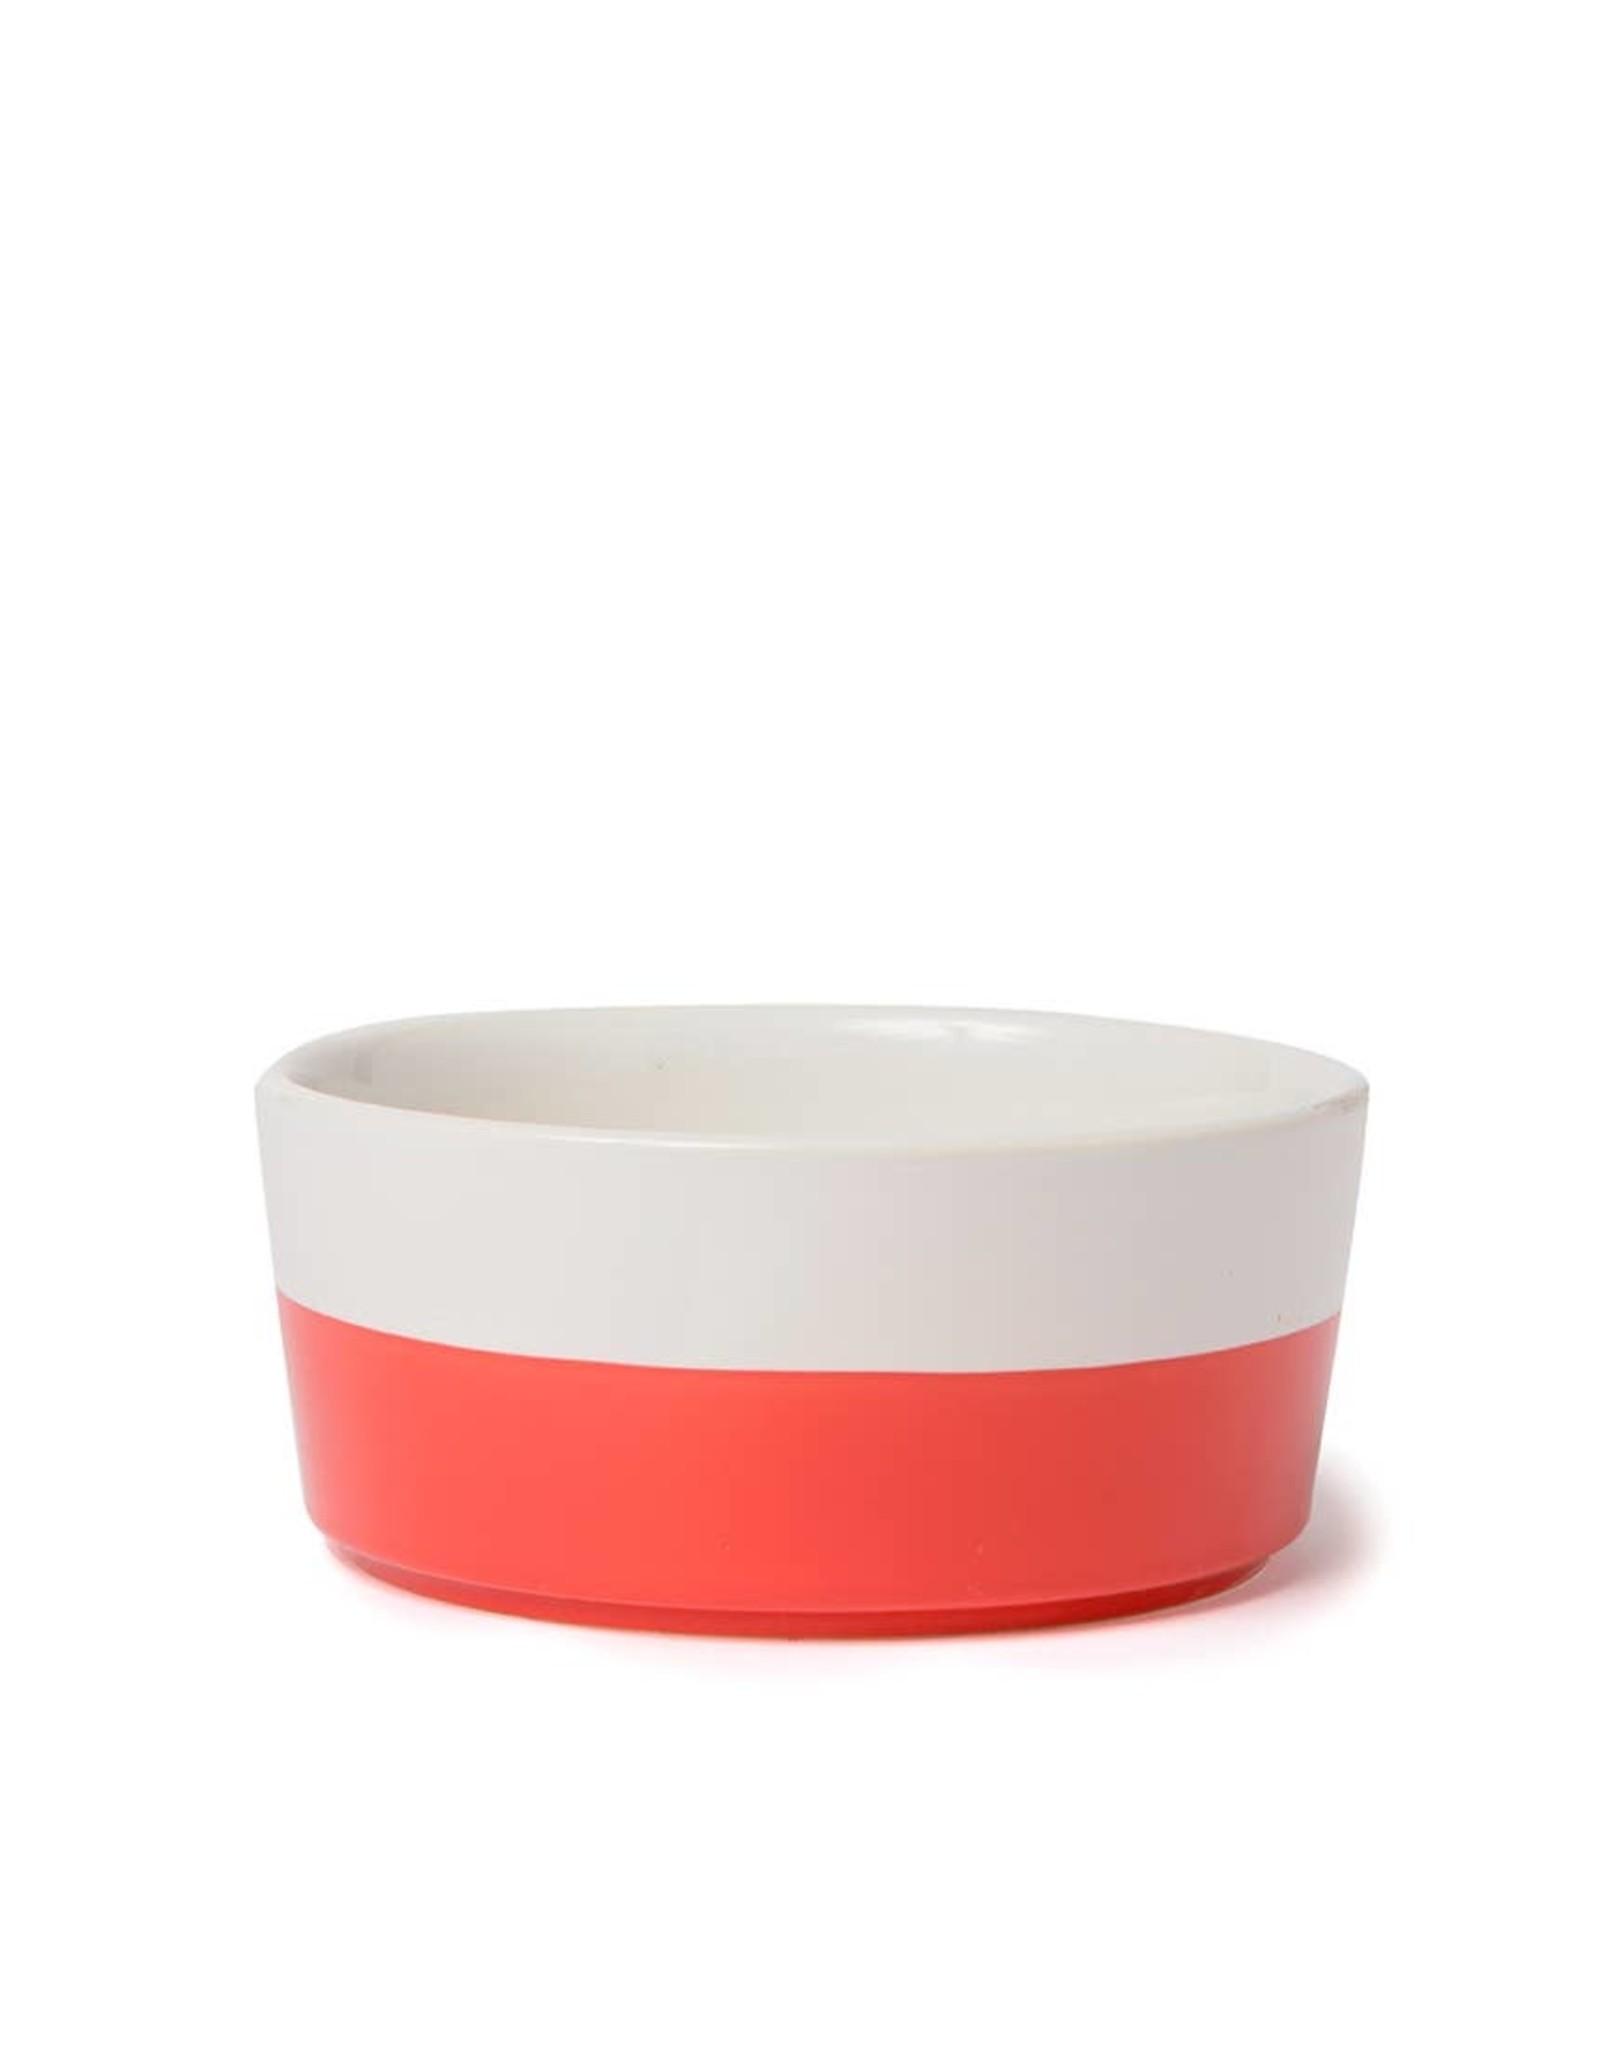 Waggo Bowl - Dipper